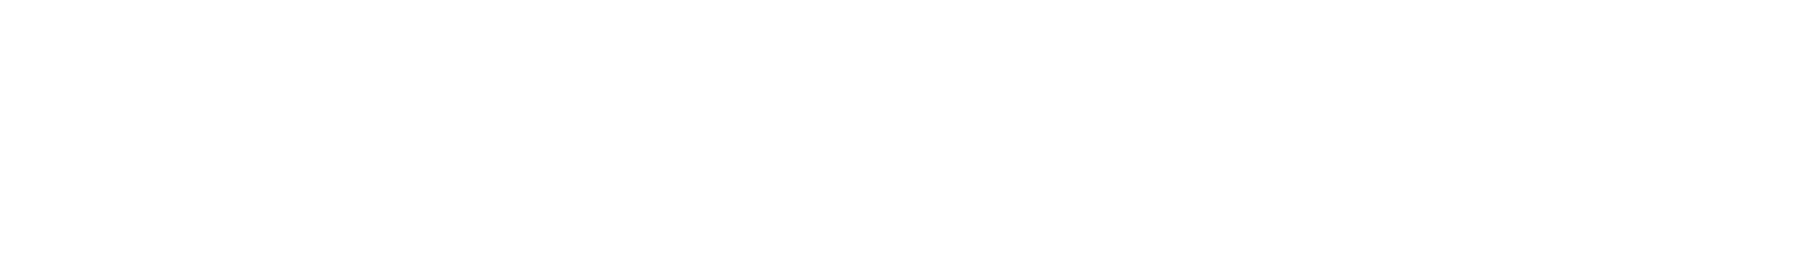 vedh melodyloop 100 fm 126bpm